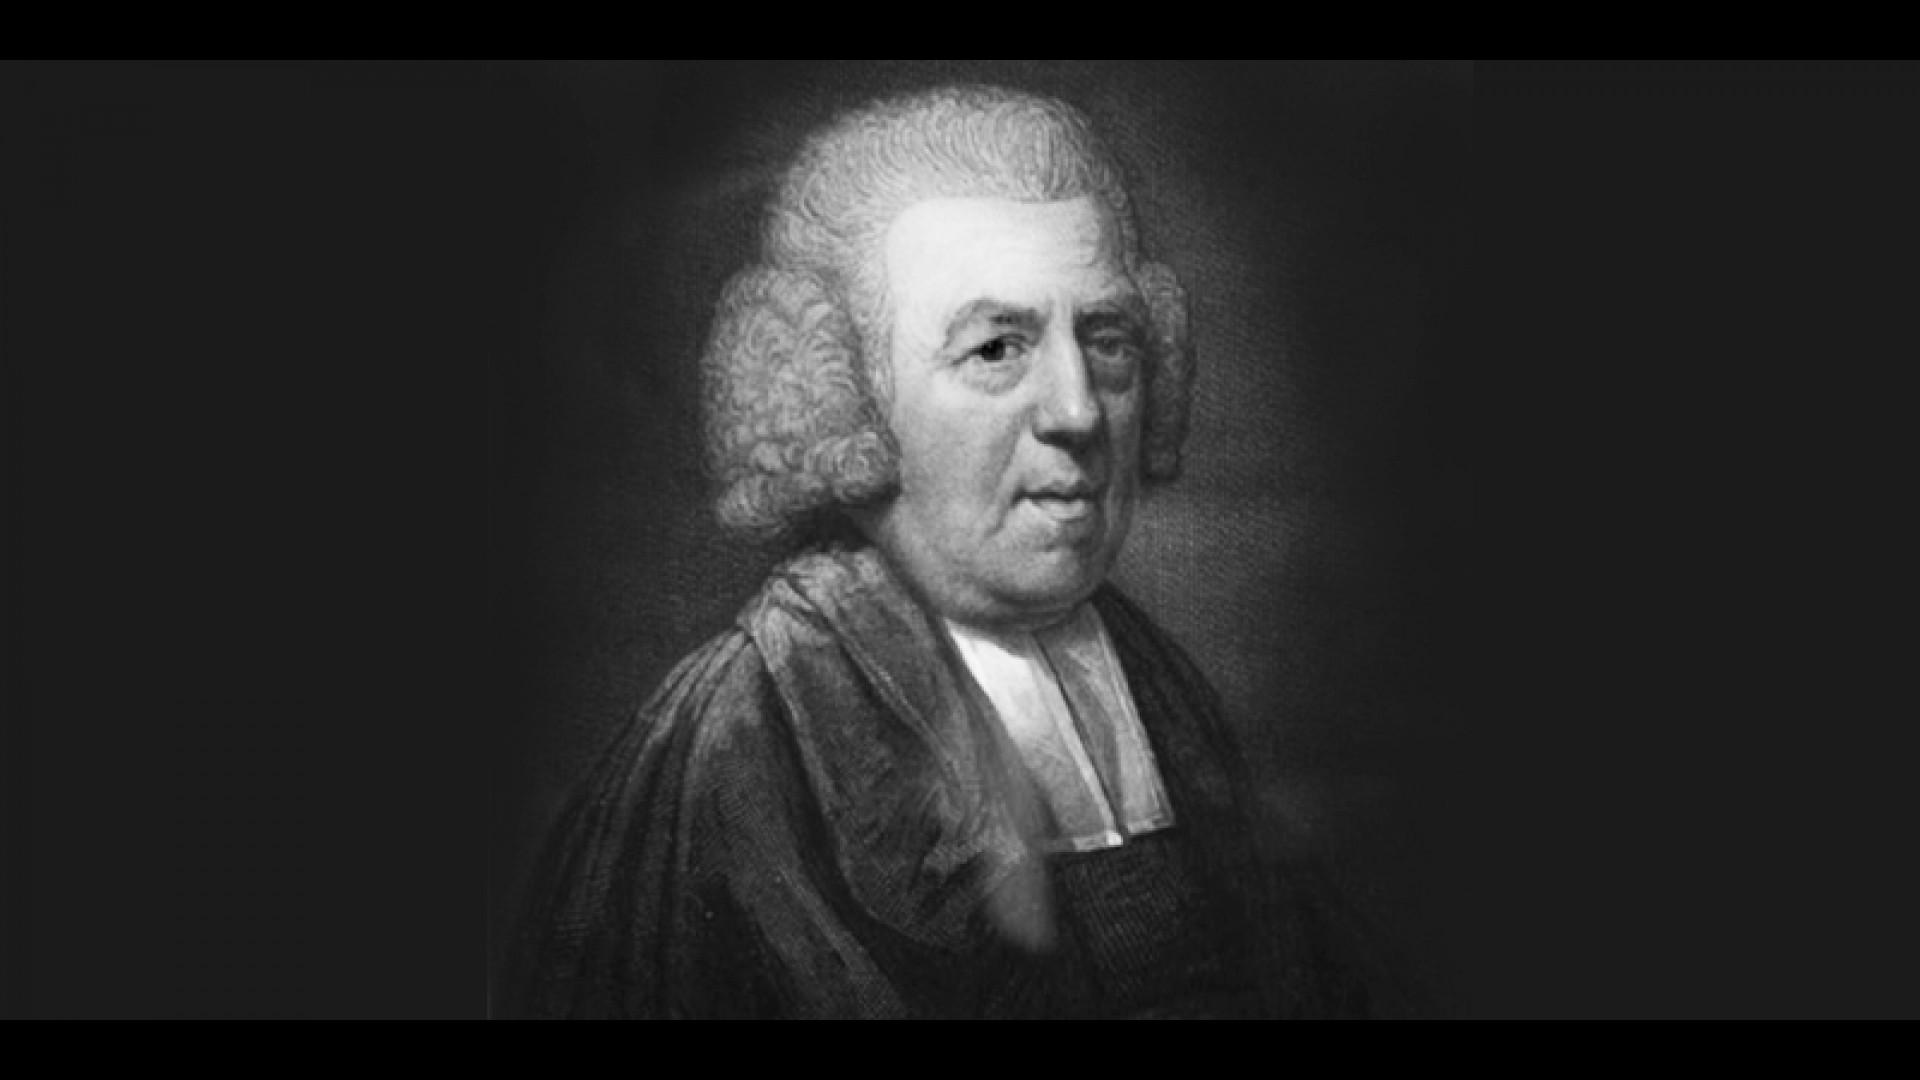 DE ESCLAVO A PASTOR: LA INCREÍBLE HISTORIA DE JOHN NEWTON